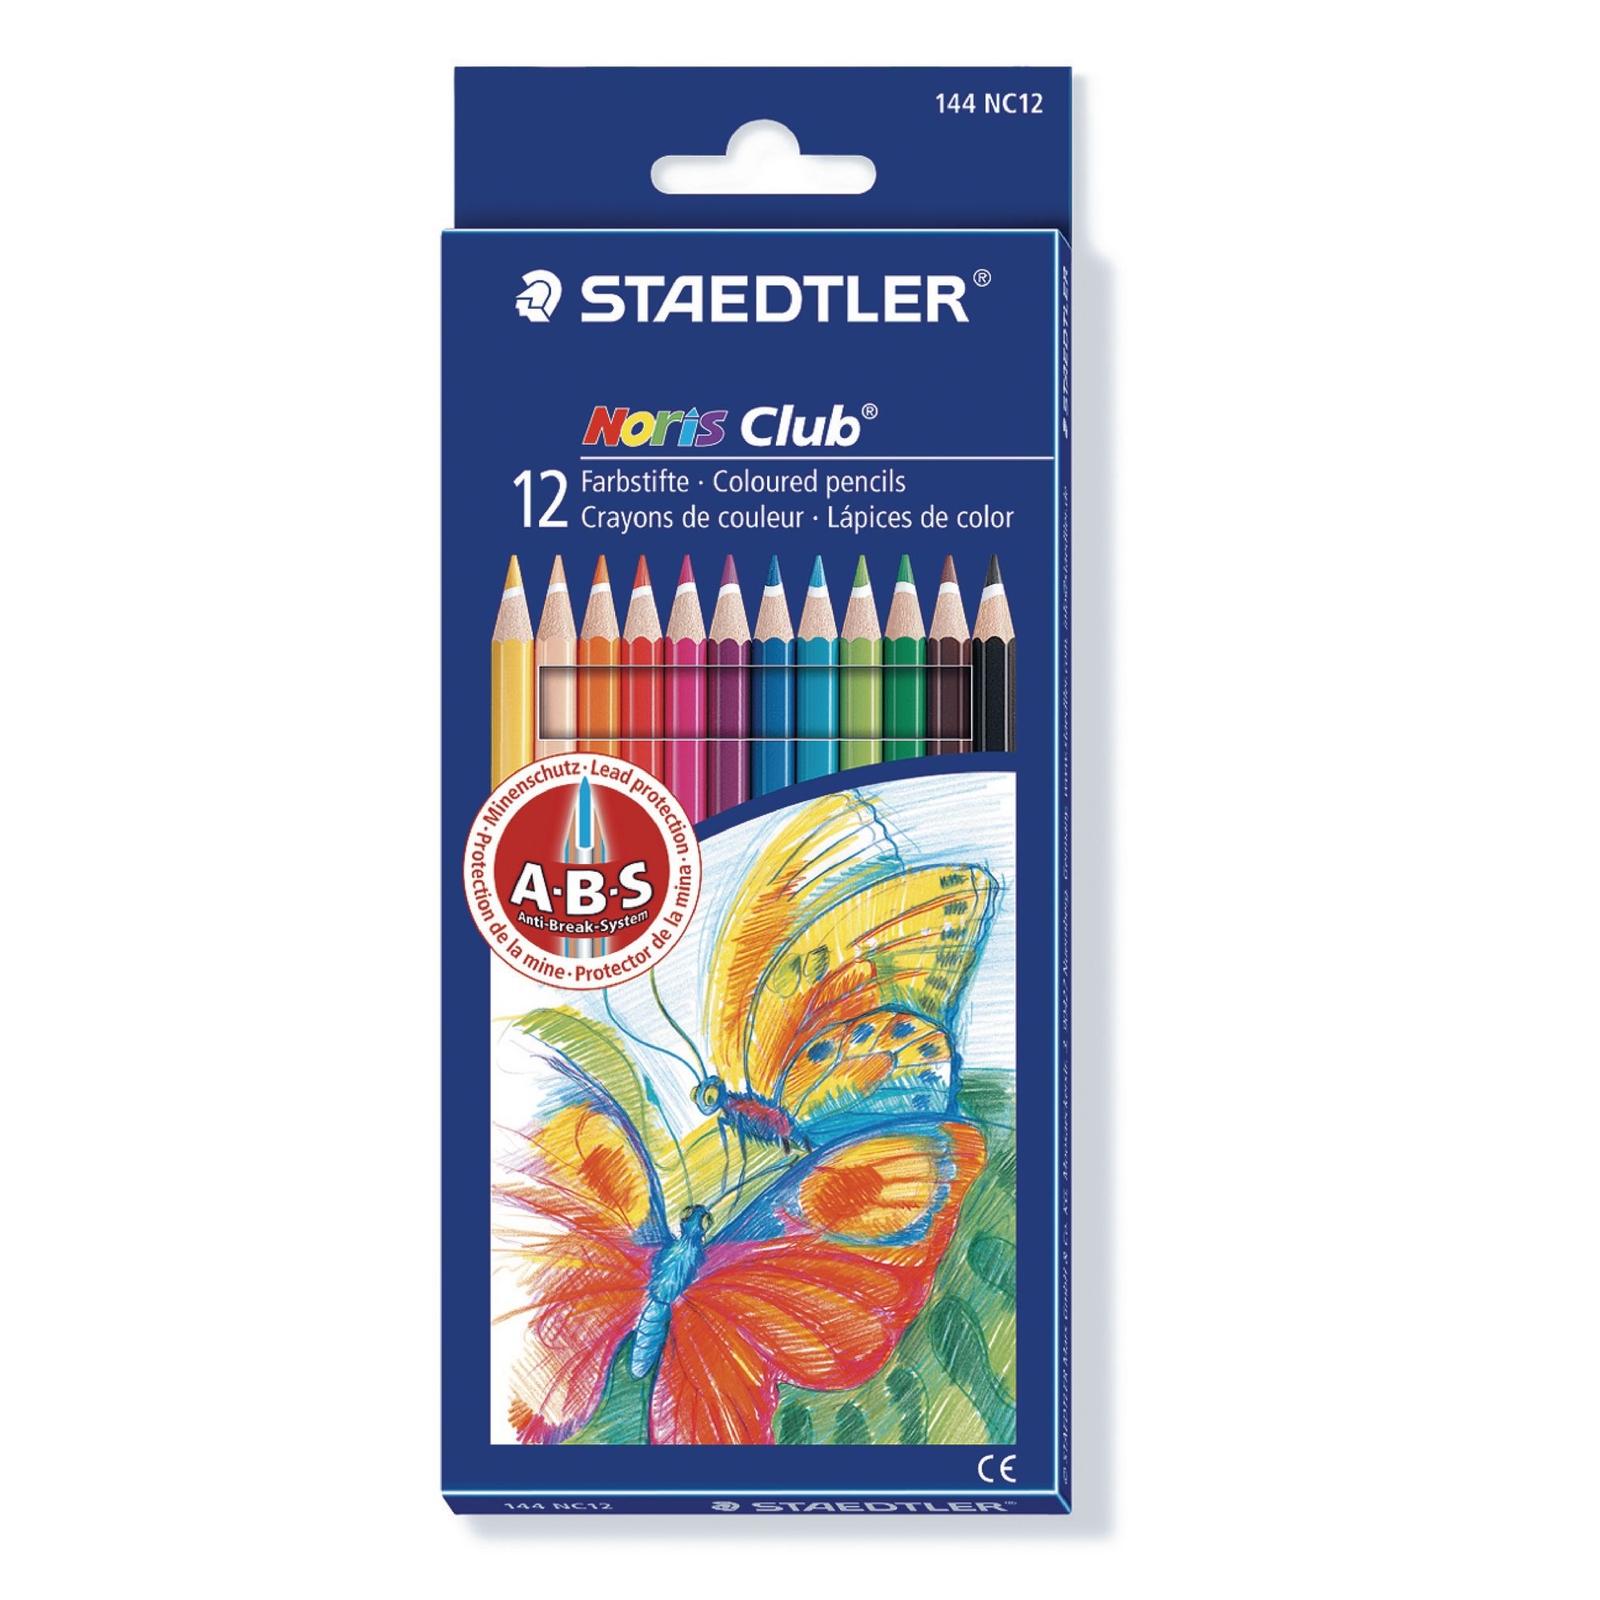 Staedtler Noris Club Colouring Pencils - Black